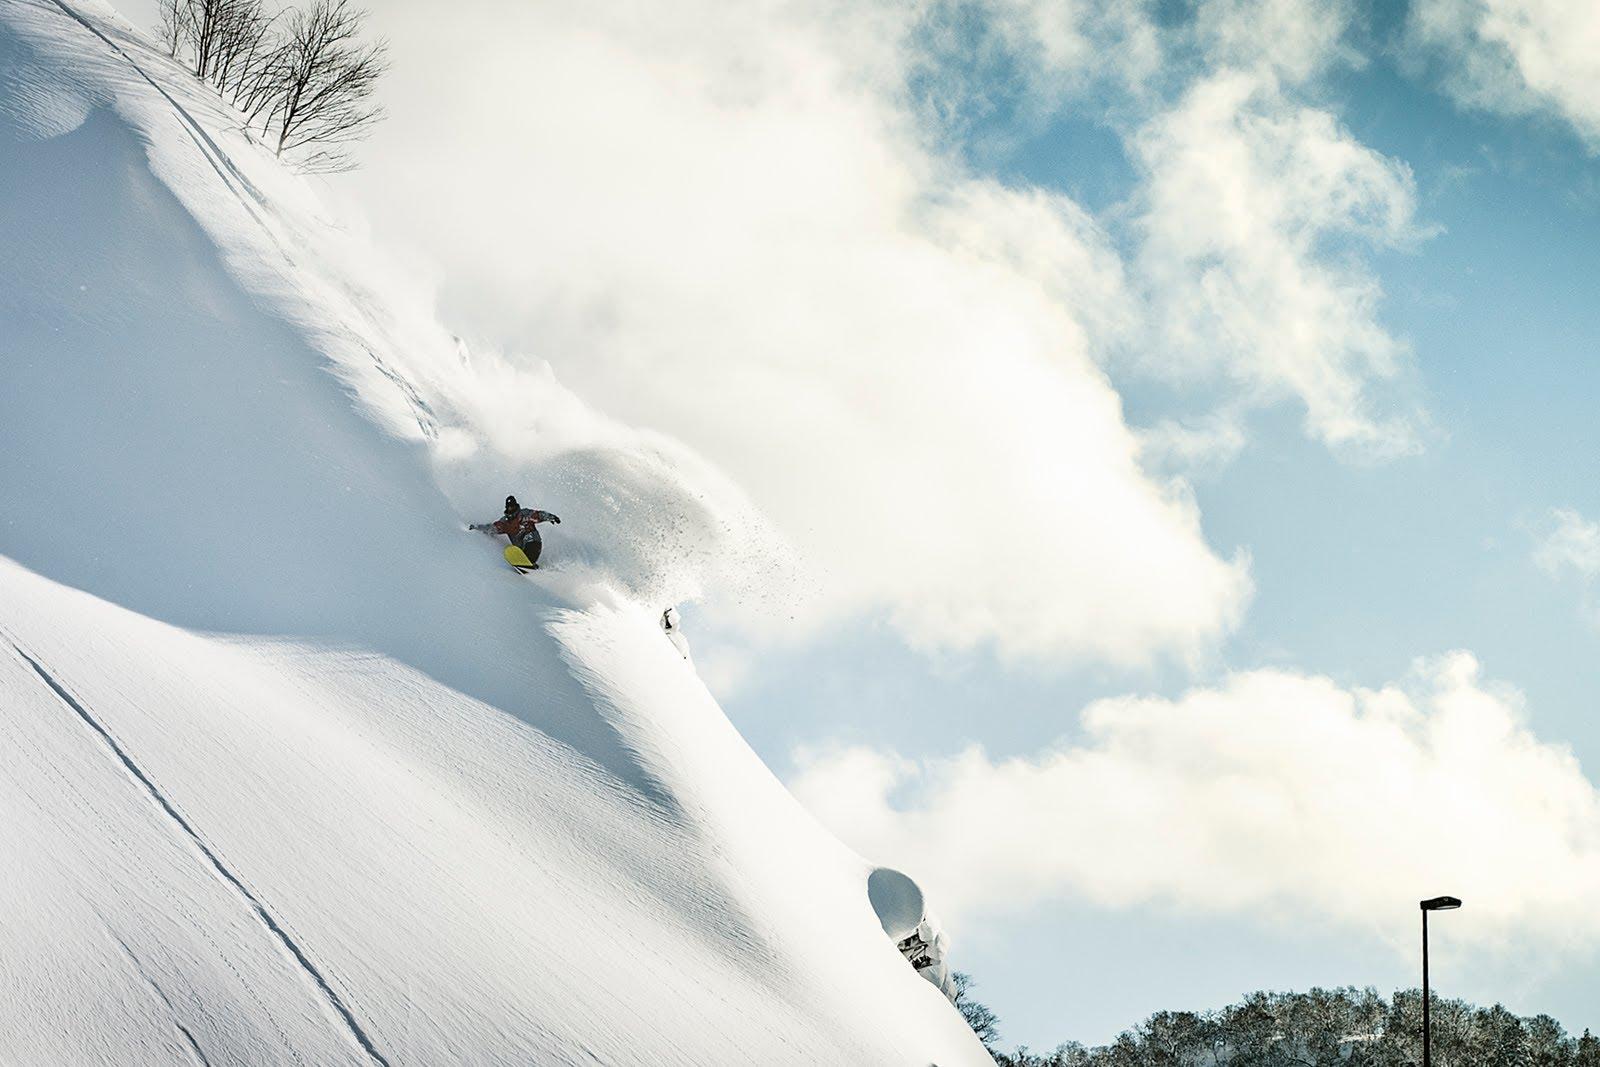 snowboarding powder turn